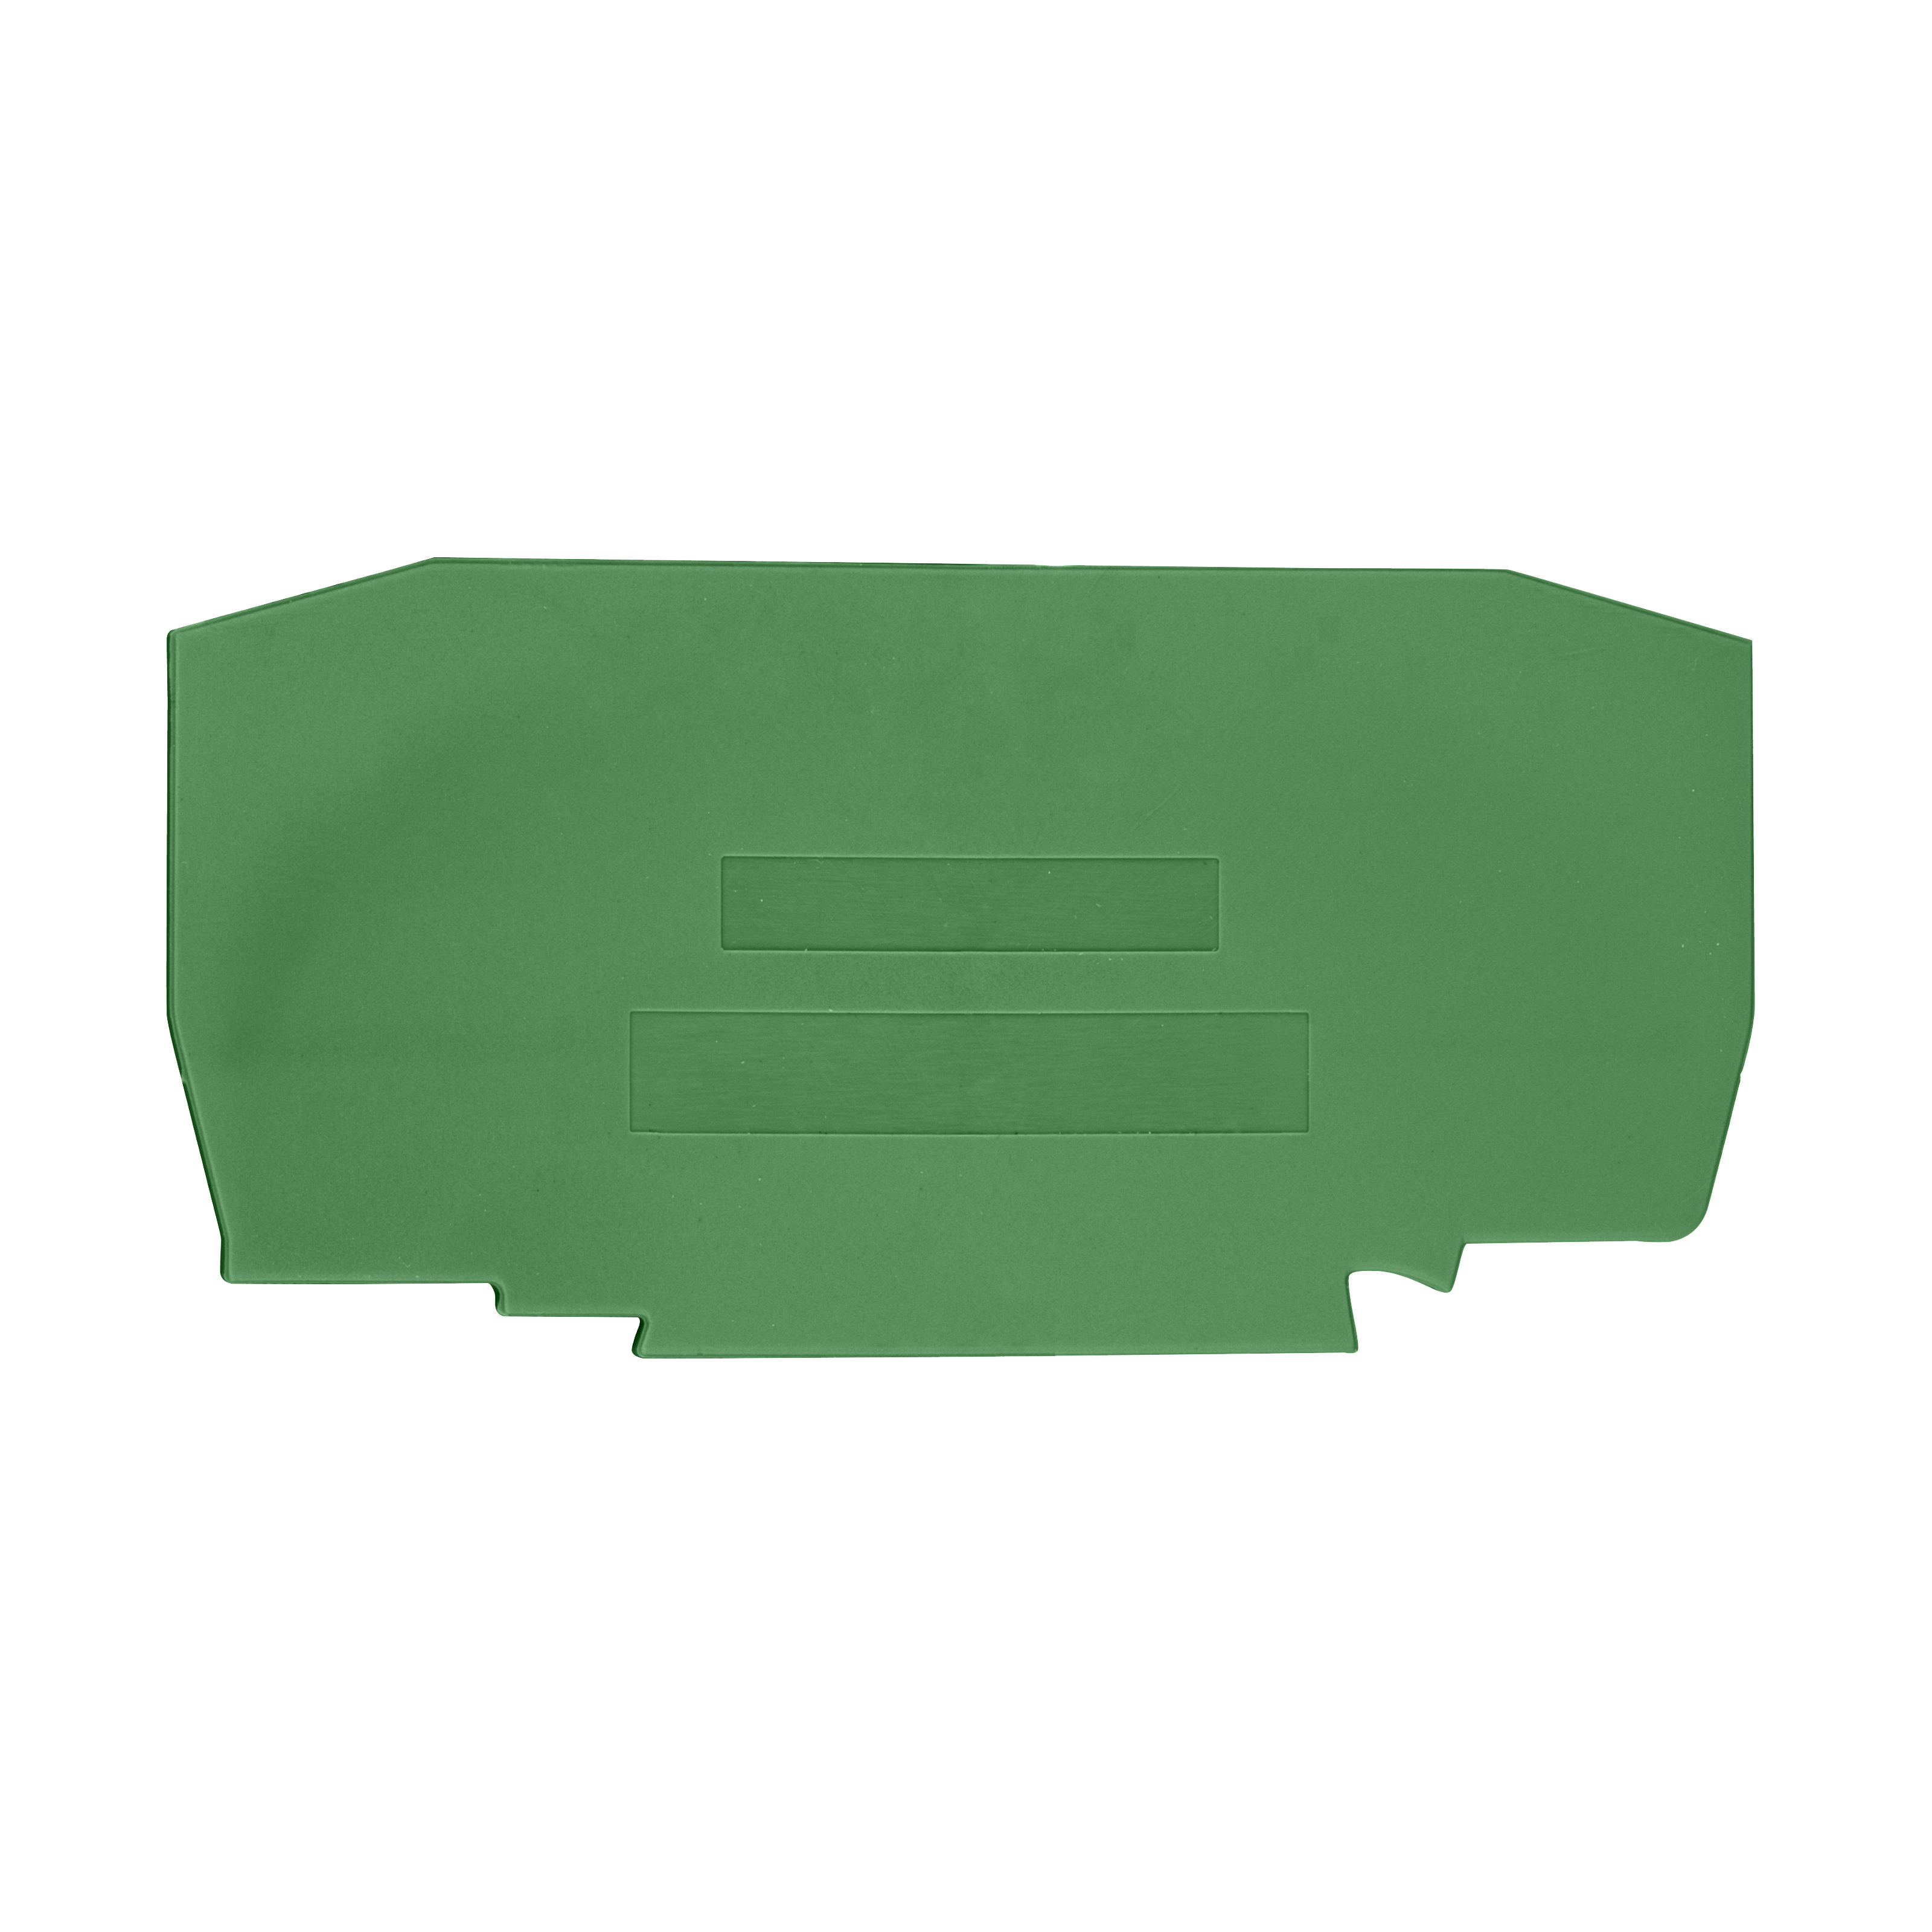 1 Stk Endplatte für Federkraftklemm Type YBK 10mm² grün IK632210--